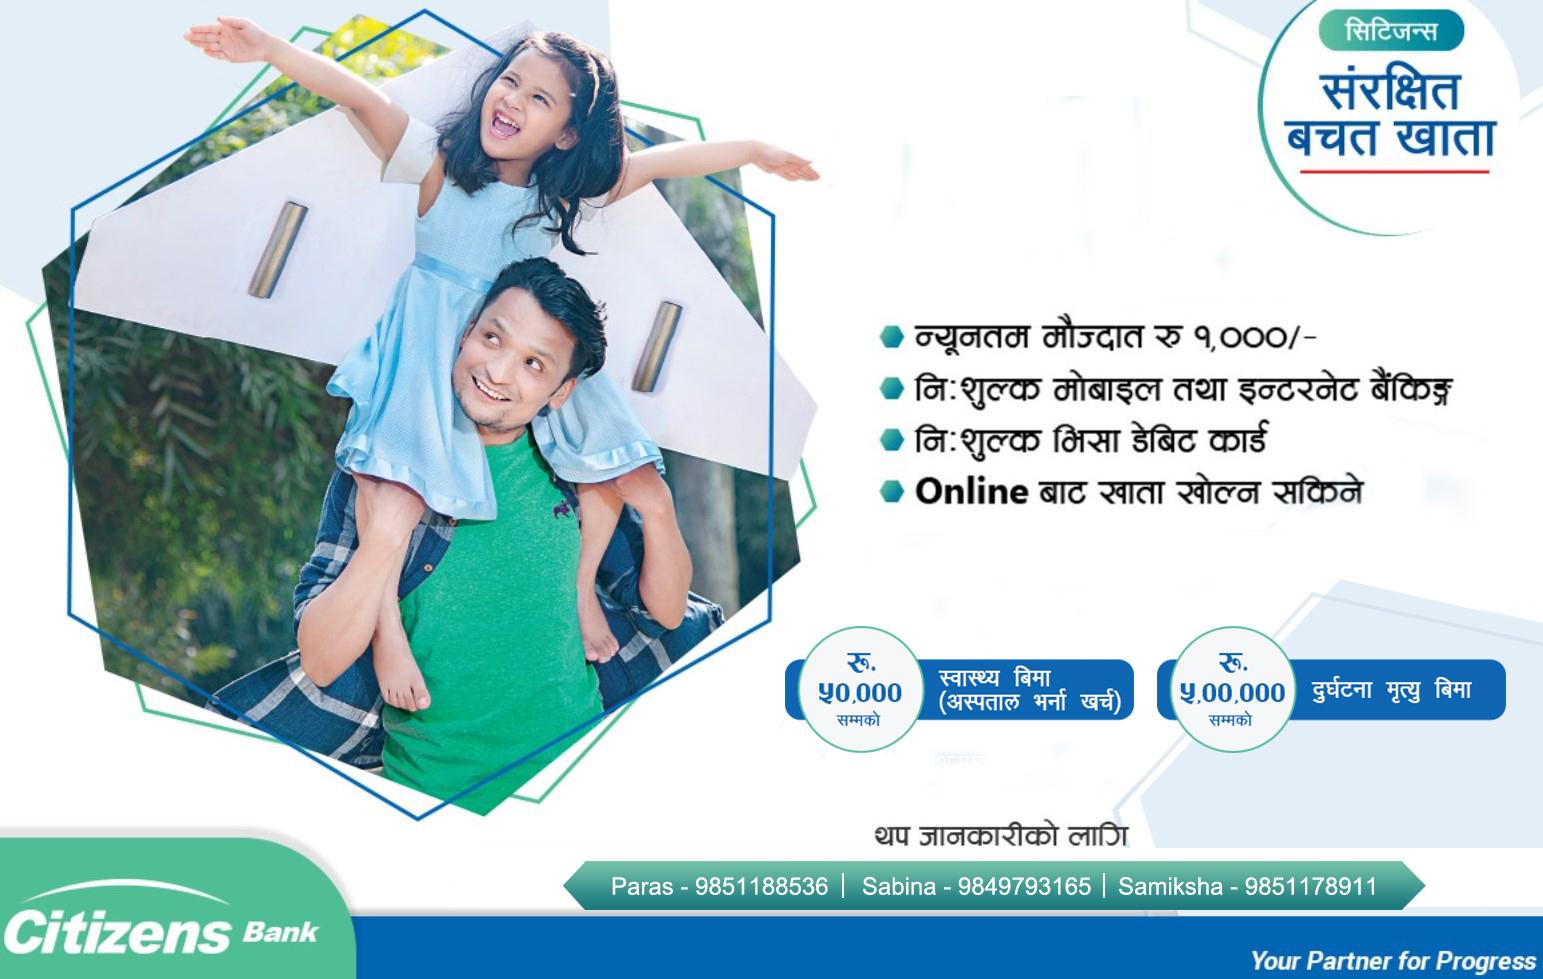 Citizens Samrakhshit Bachat Khata